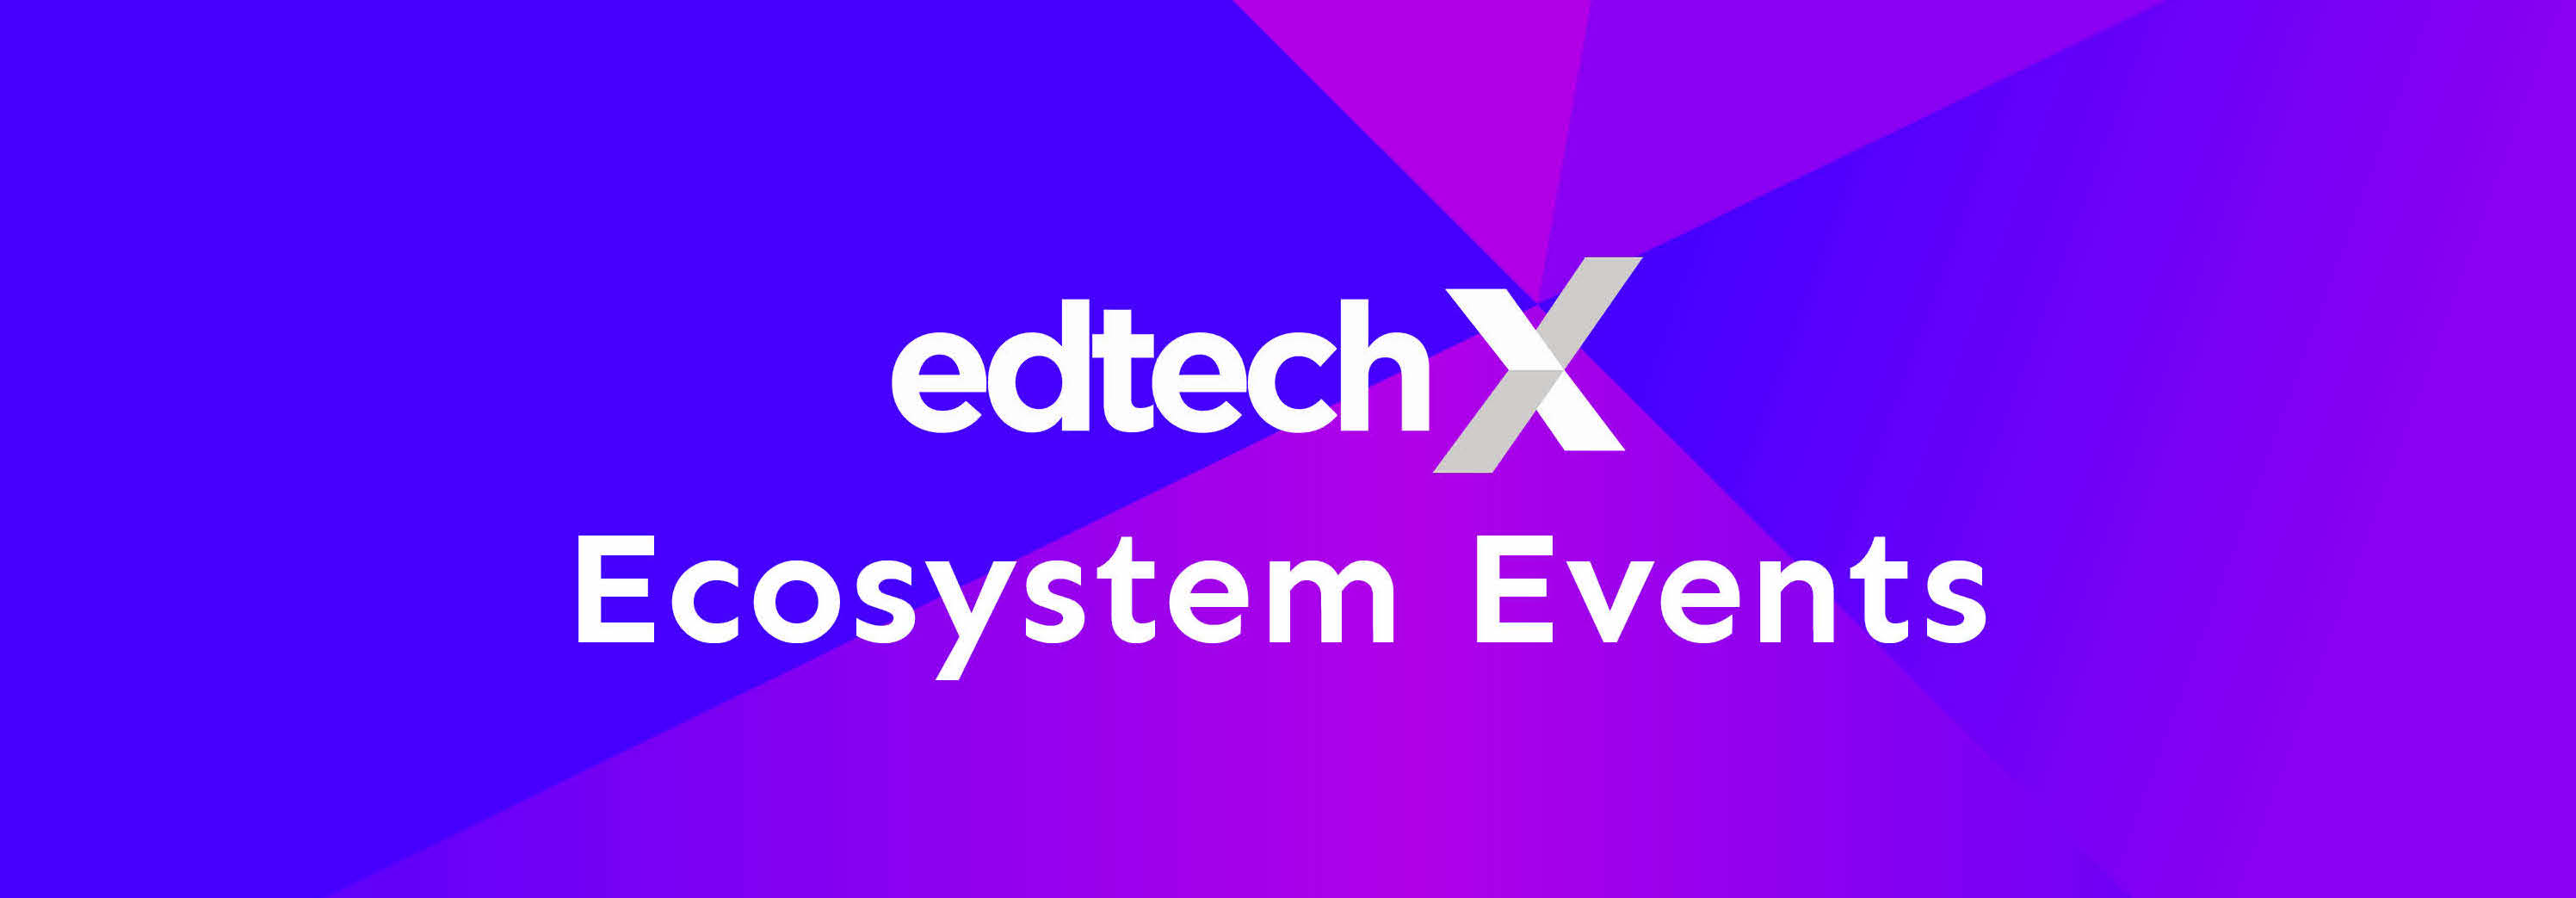 EdTechX Ecosystem Events 2019